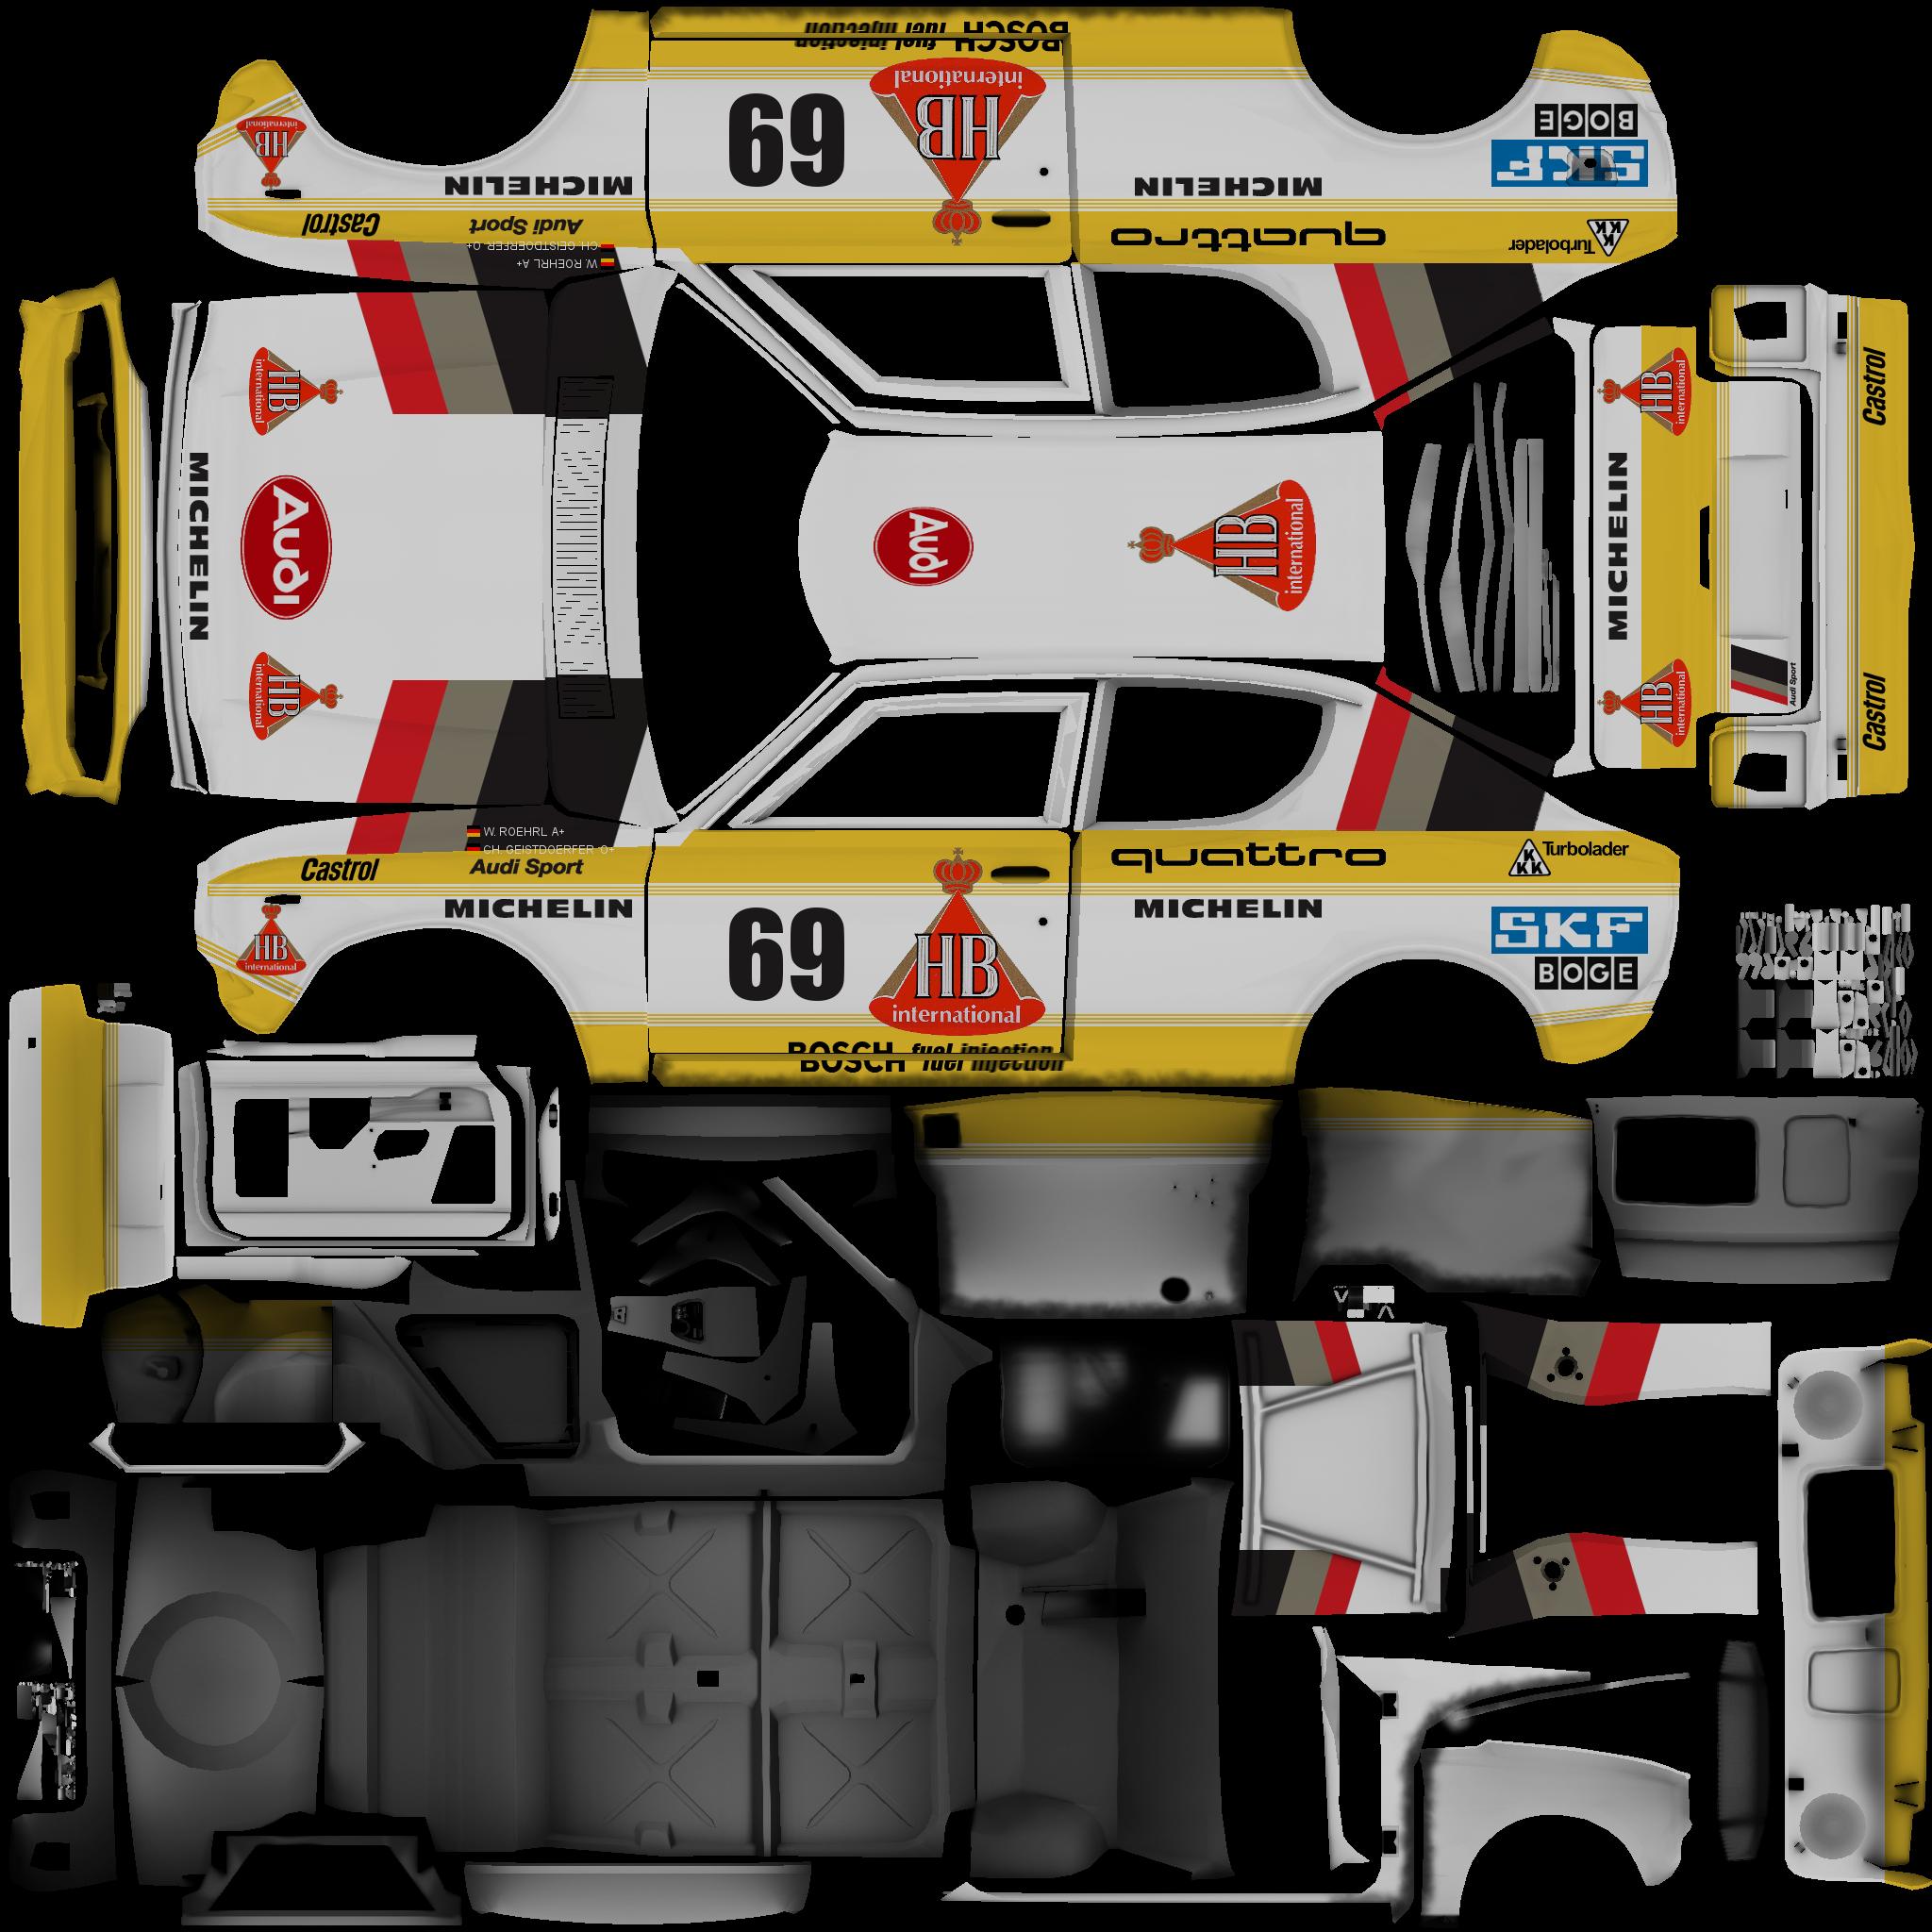 Steam Közösség Audi Quattro S1 Walter Roehrl